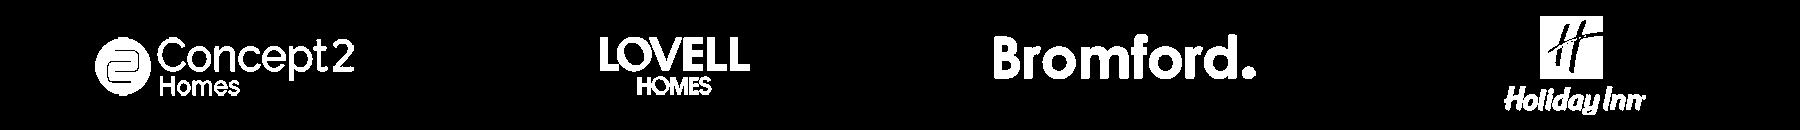 Client Logos 7